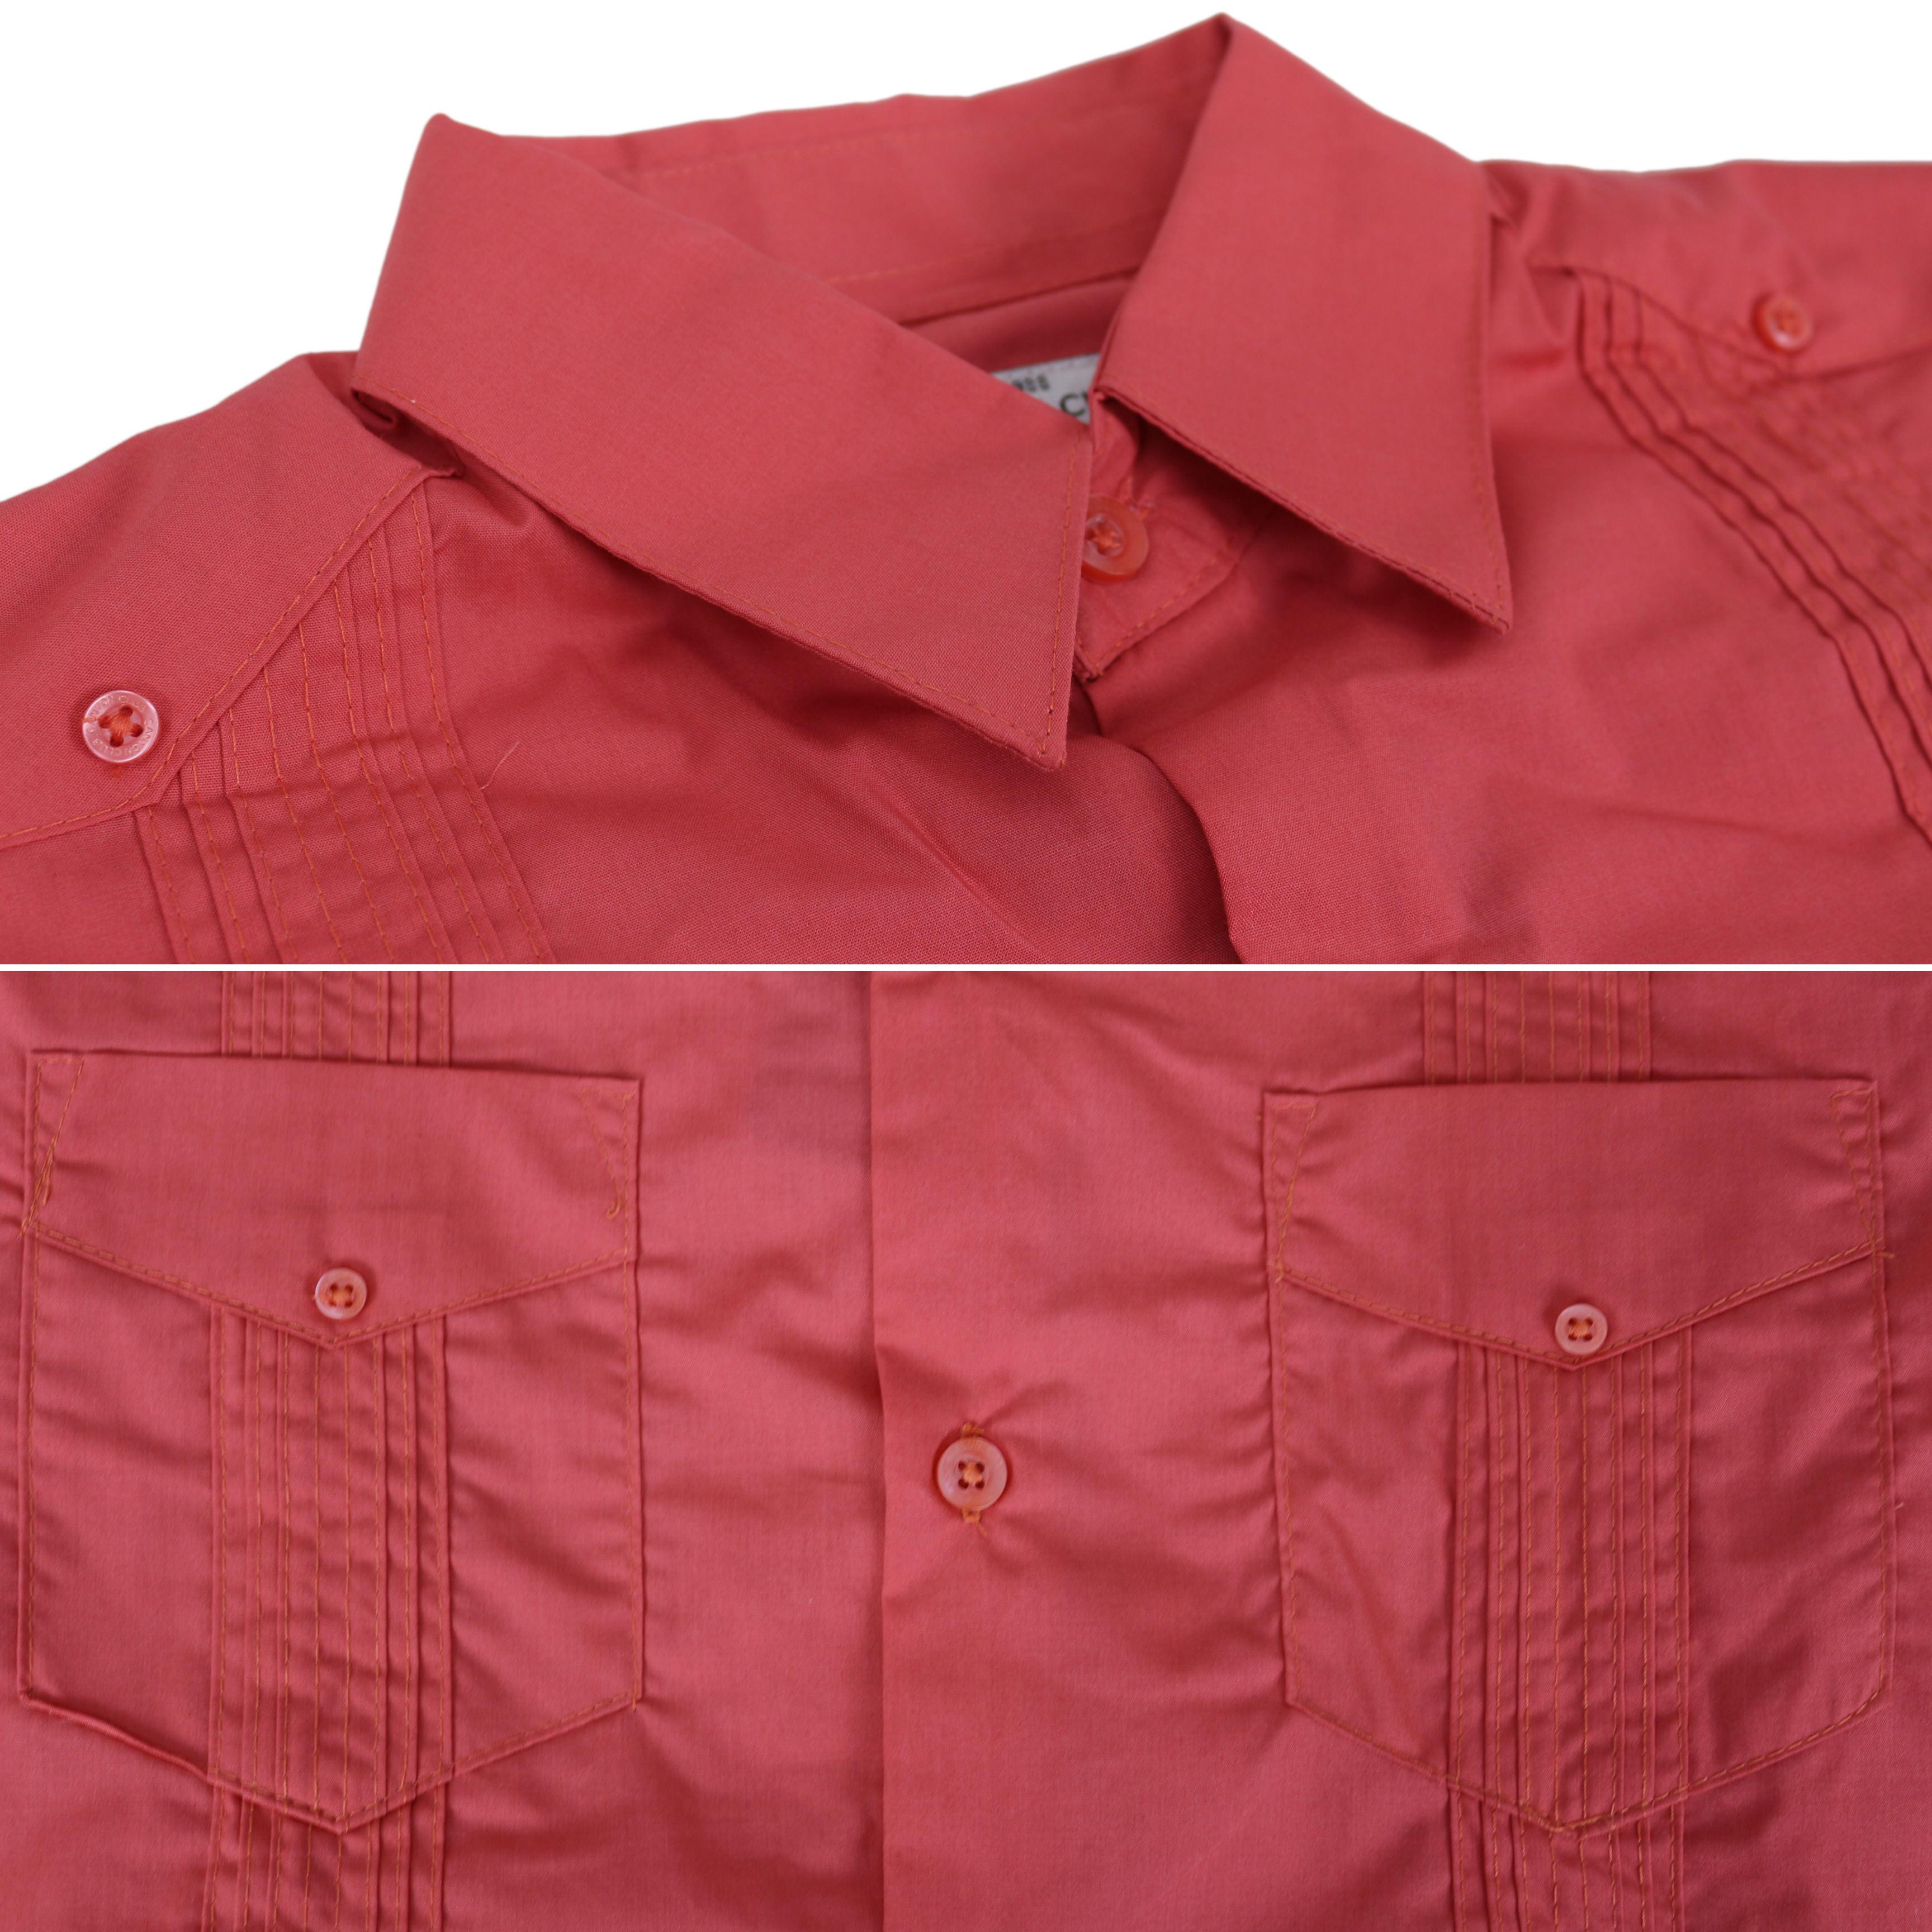 Men-039-s-Guayabera-Cuban-Beach-Long-Sleeve-Button-Up-Casual-Dress-Shirt-SLIM-FIT thumbnail 17